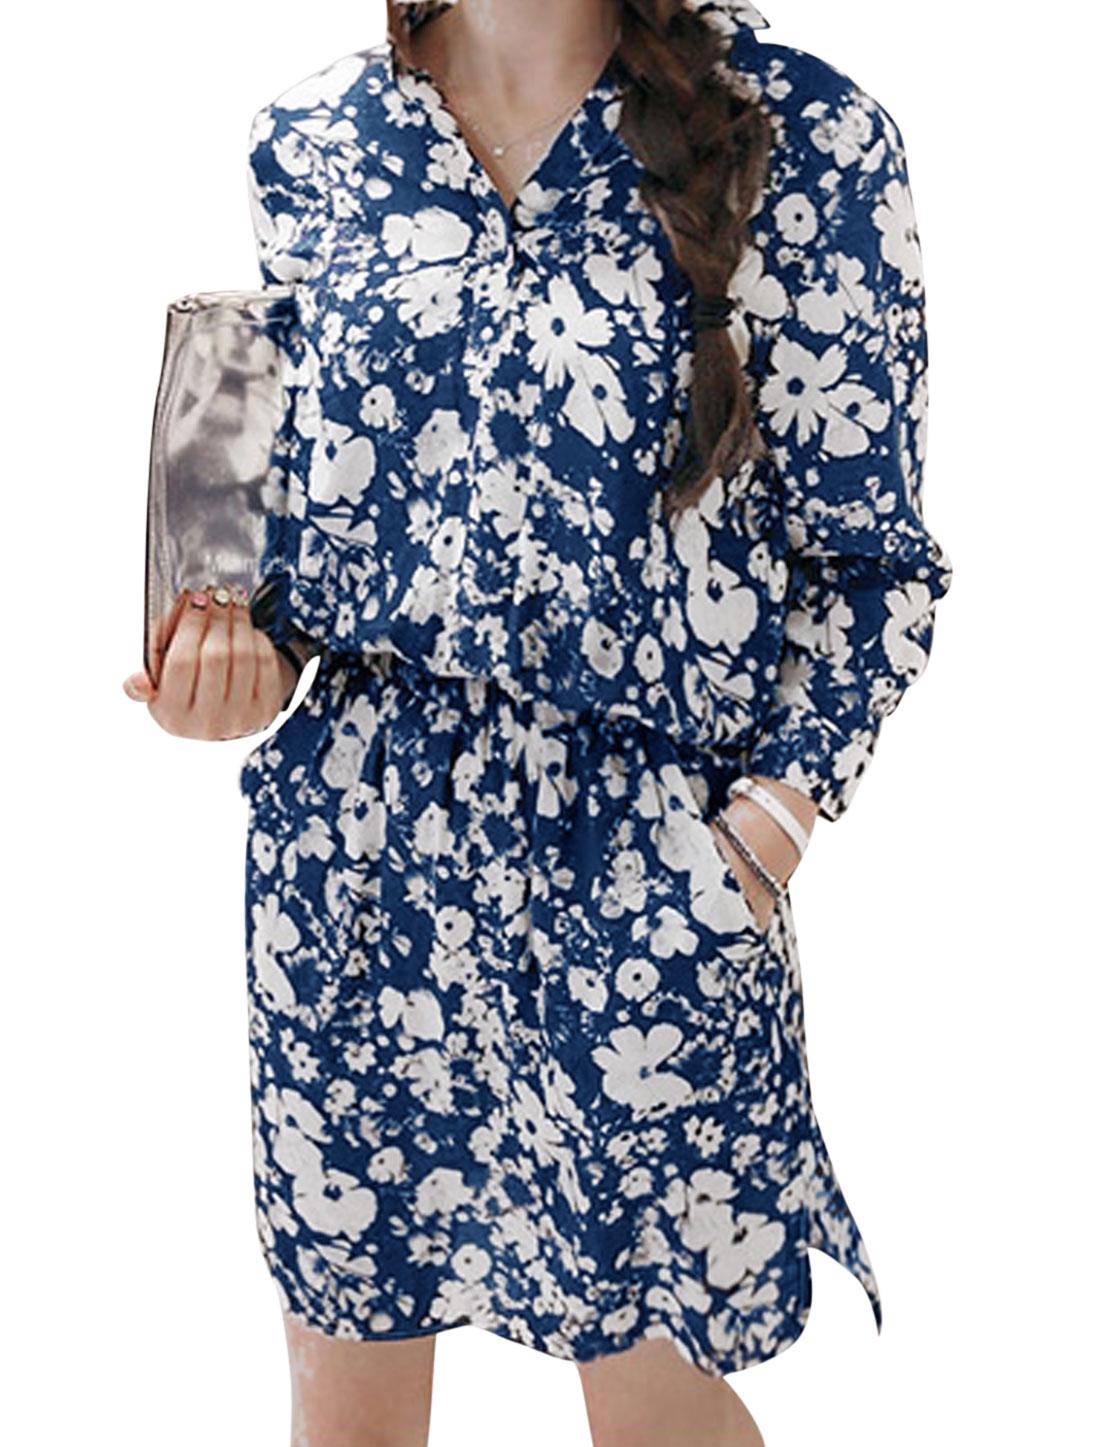 Lady Split Neck Floral Pattern Elastic Waist Casual Shirt Dress Blue XS